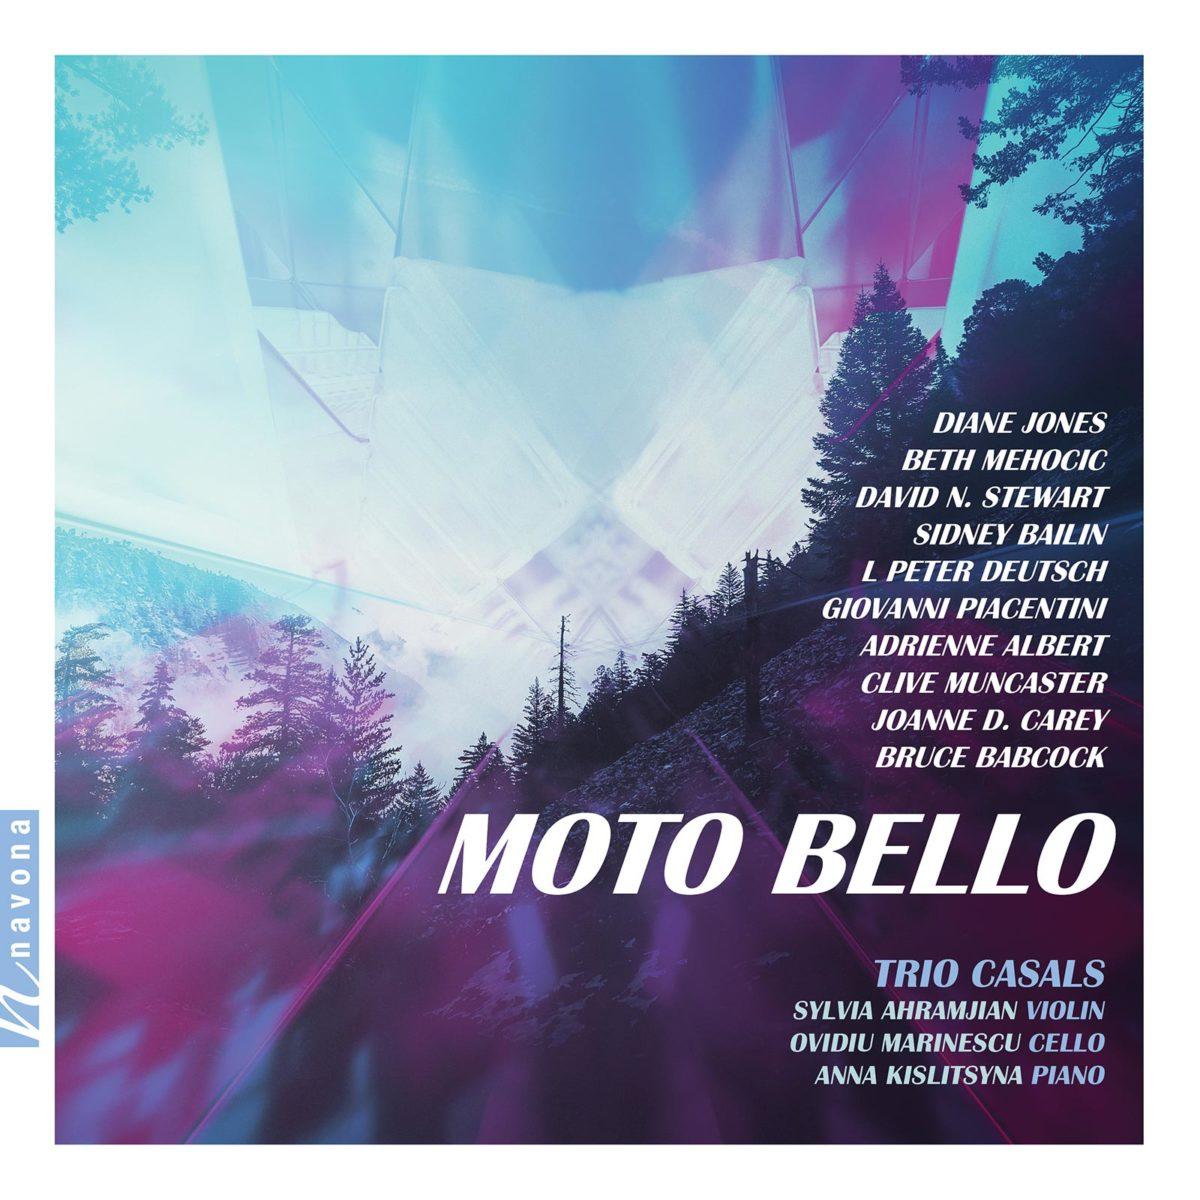 Moto Bello